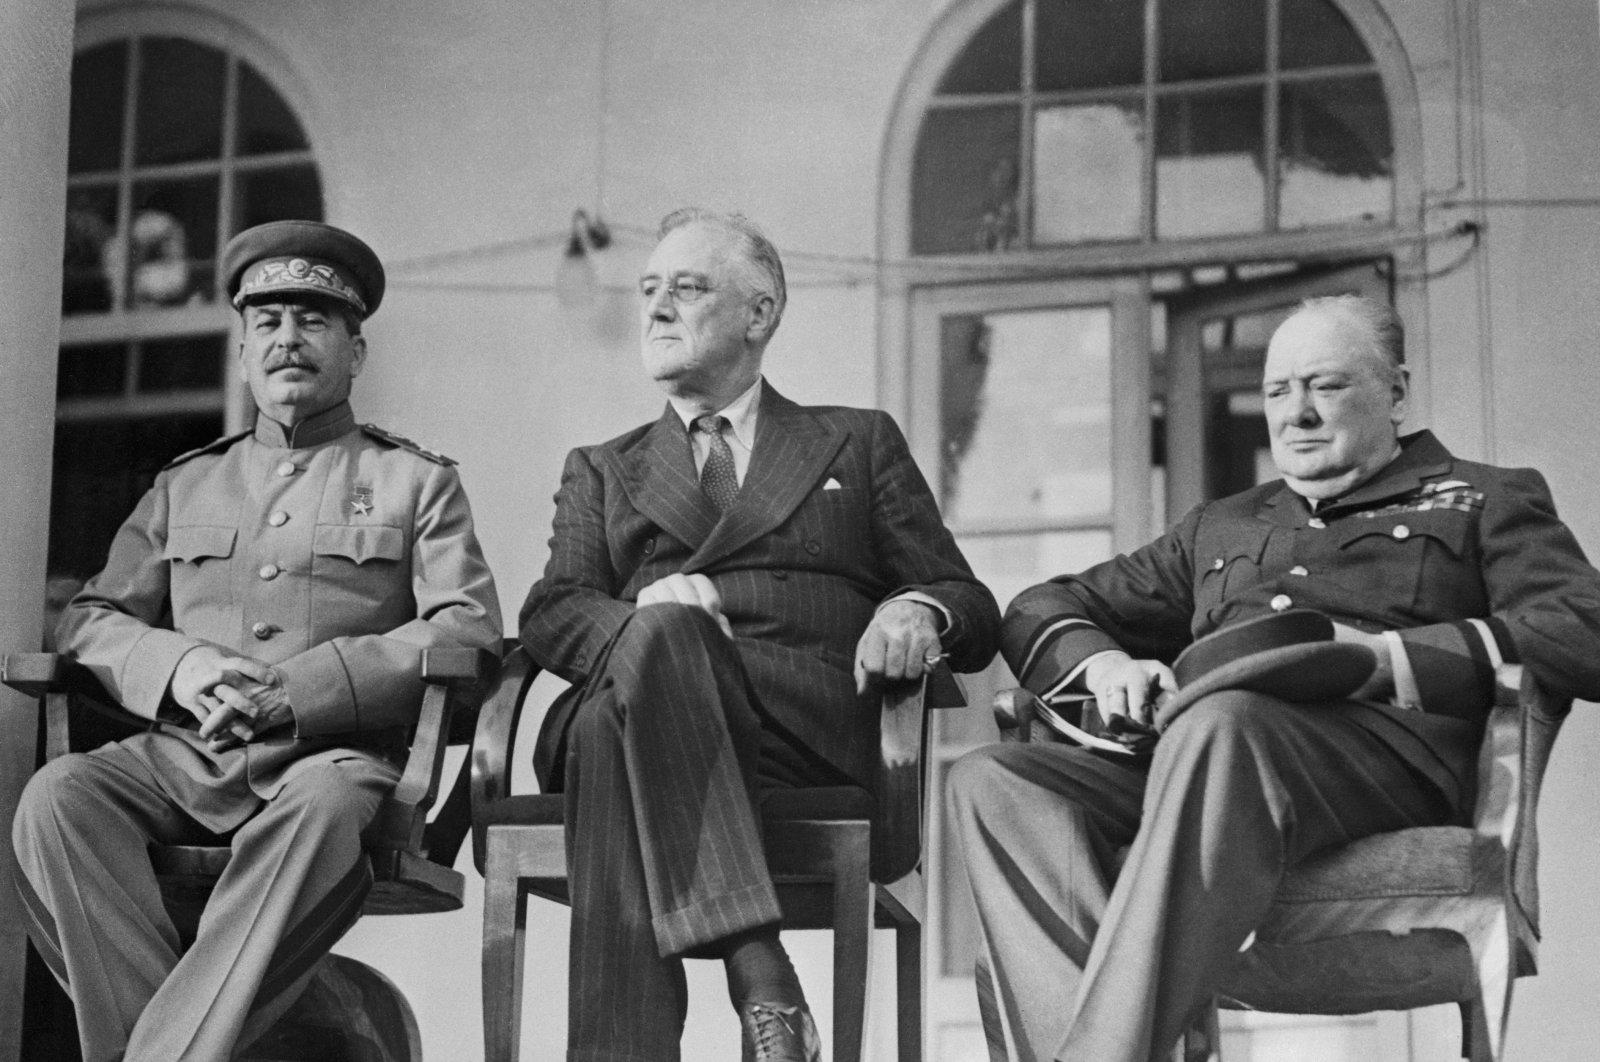 Soviet Union leader Josef Stalin (L), U.S. President Franklin Roosevelt (C) and U.K. Prime Minister Winston Churchill confer in the Soviet Embassy during the Tehran Conference, Tehran, Iran, Dec. 7, 1943. (Getty Images)